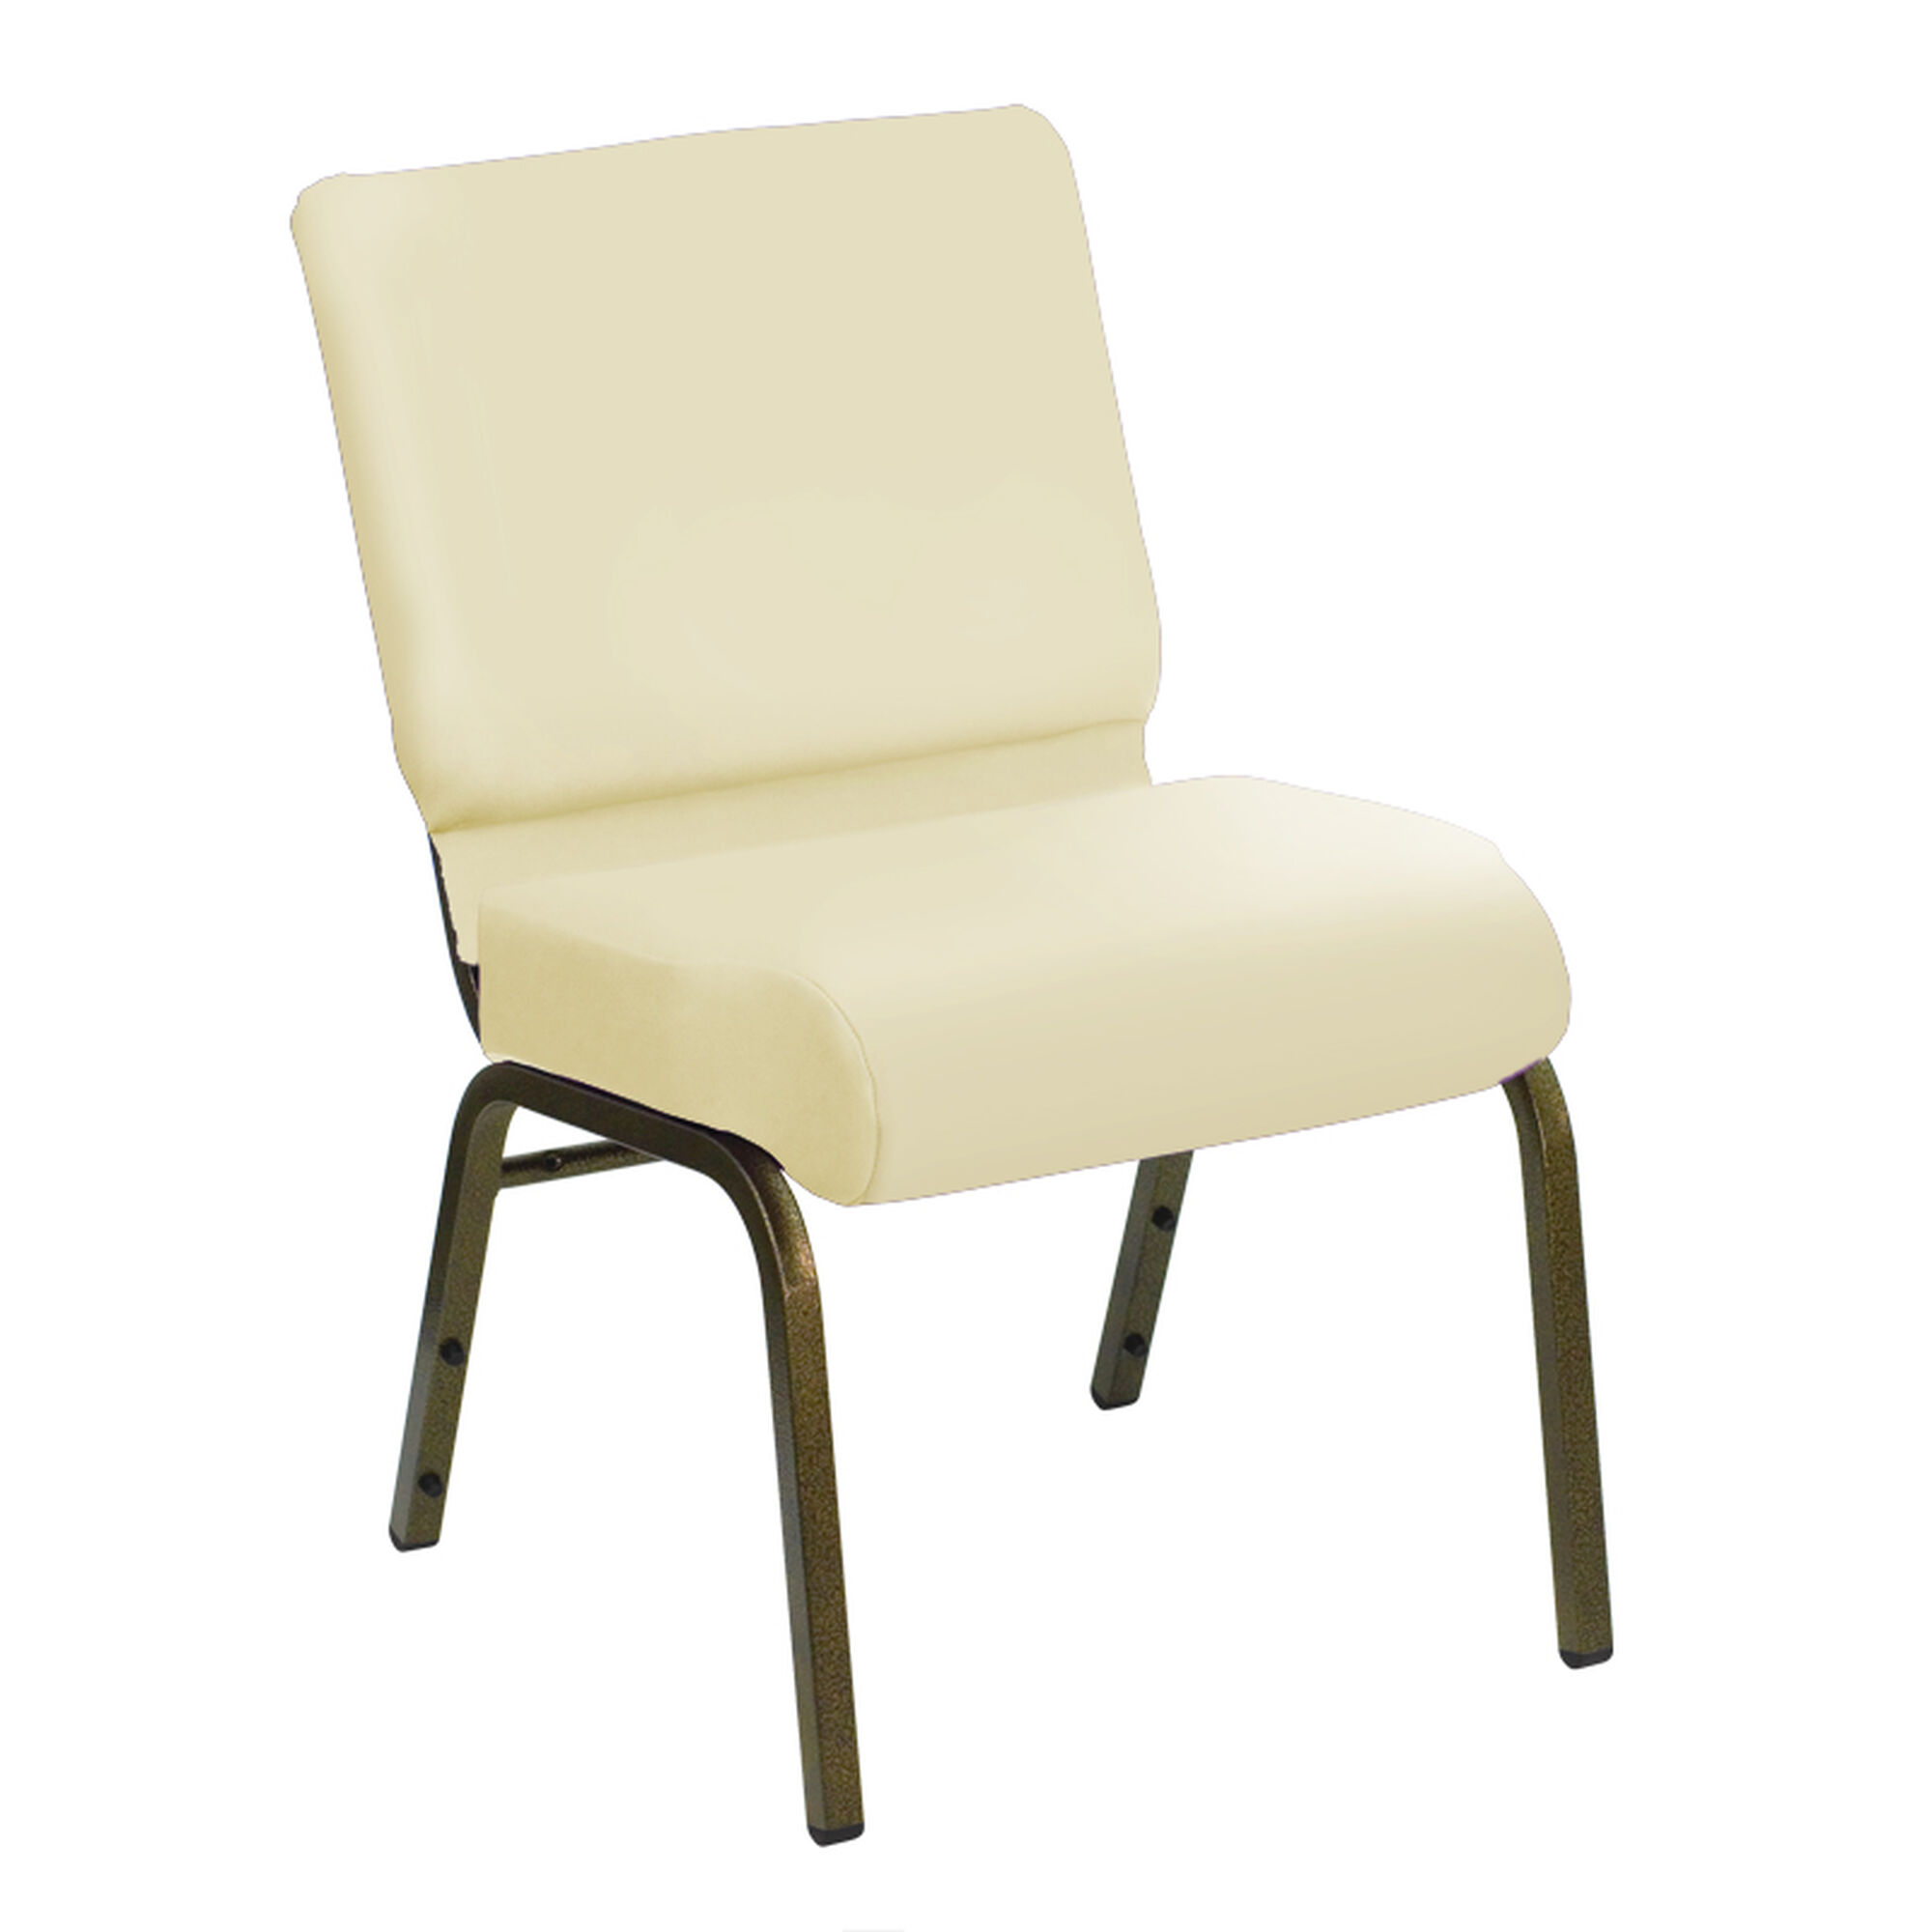 Flash furniture hercules series 21 39 39 w church chair in e z for Furniture 4 less